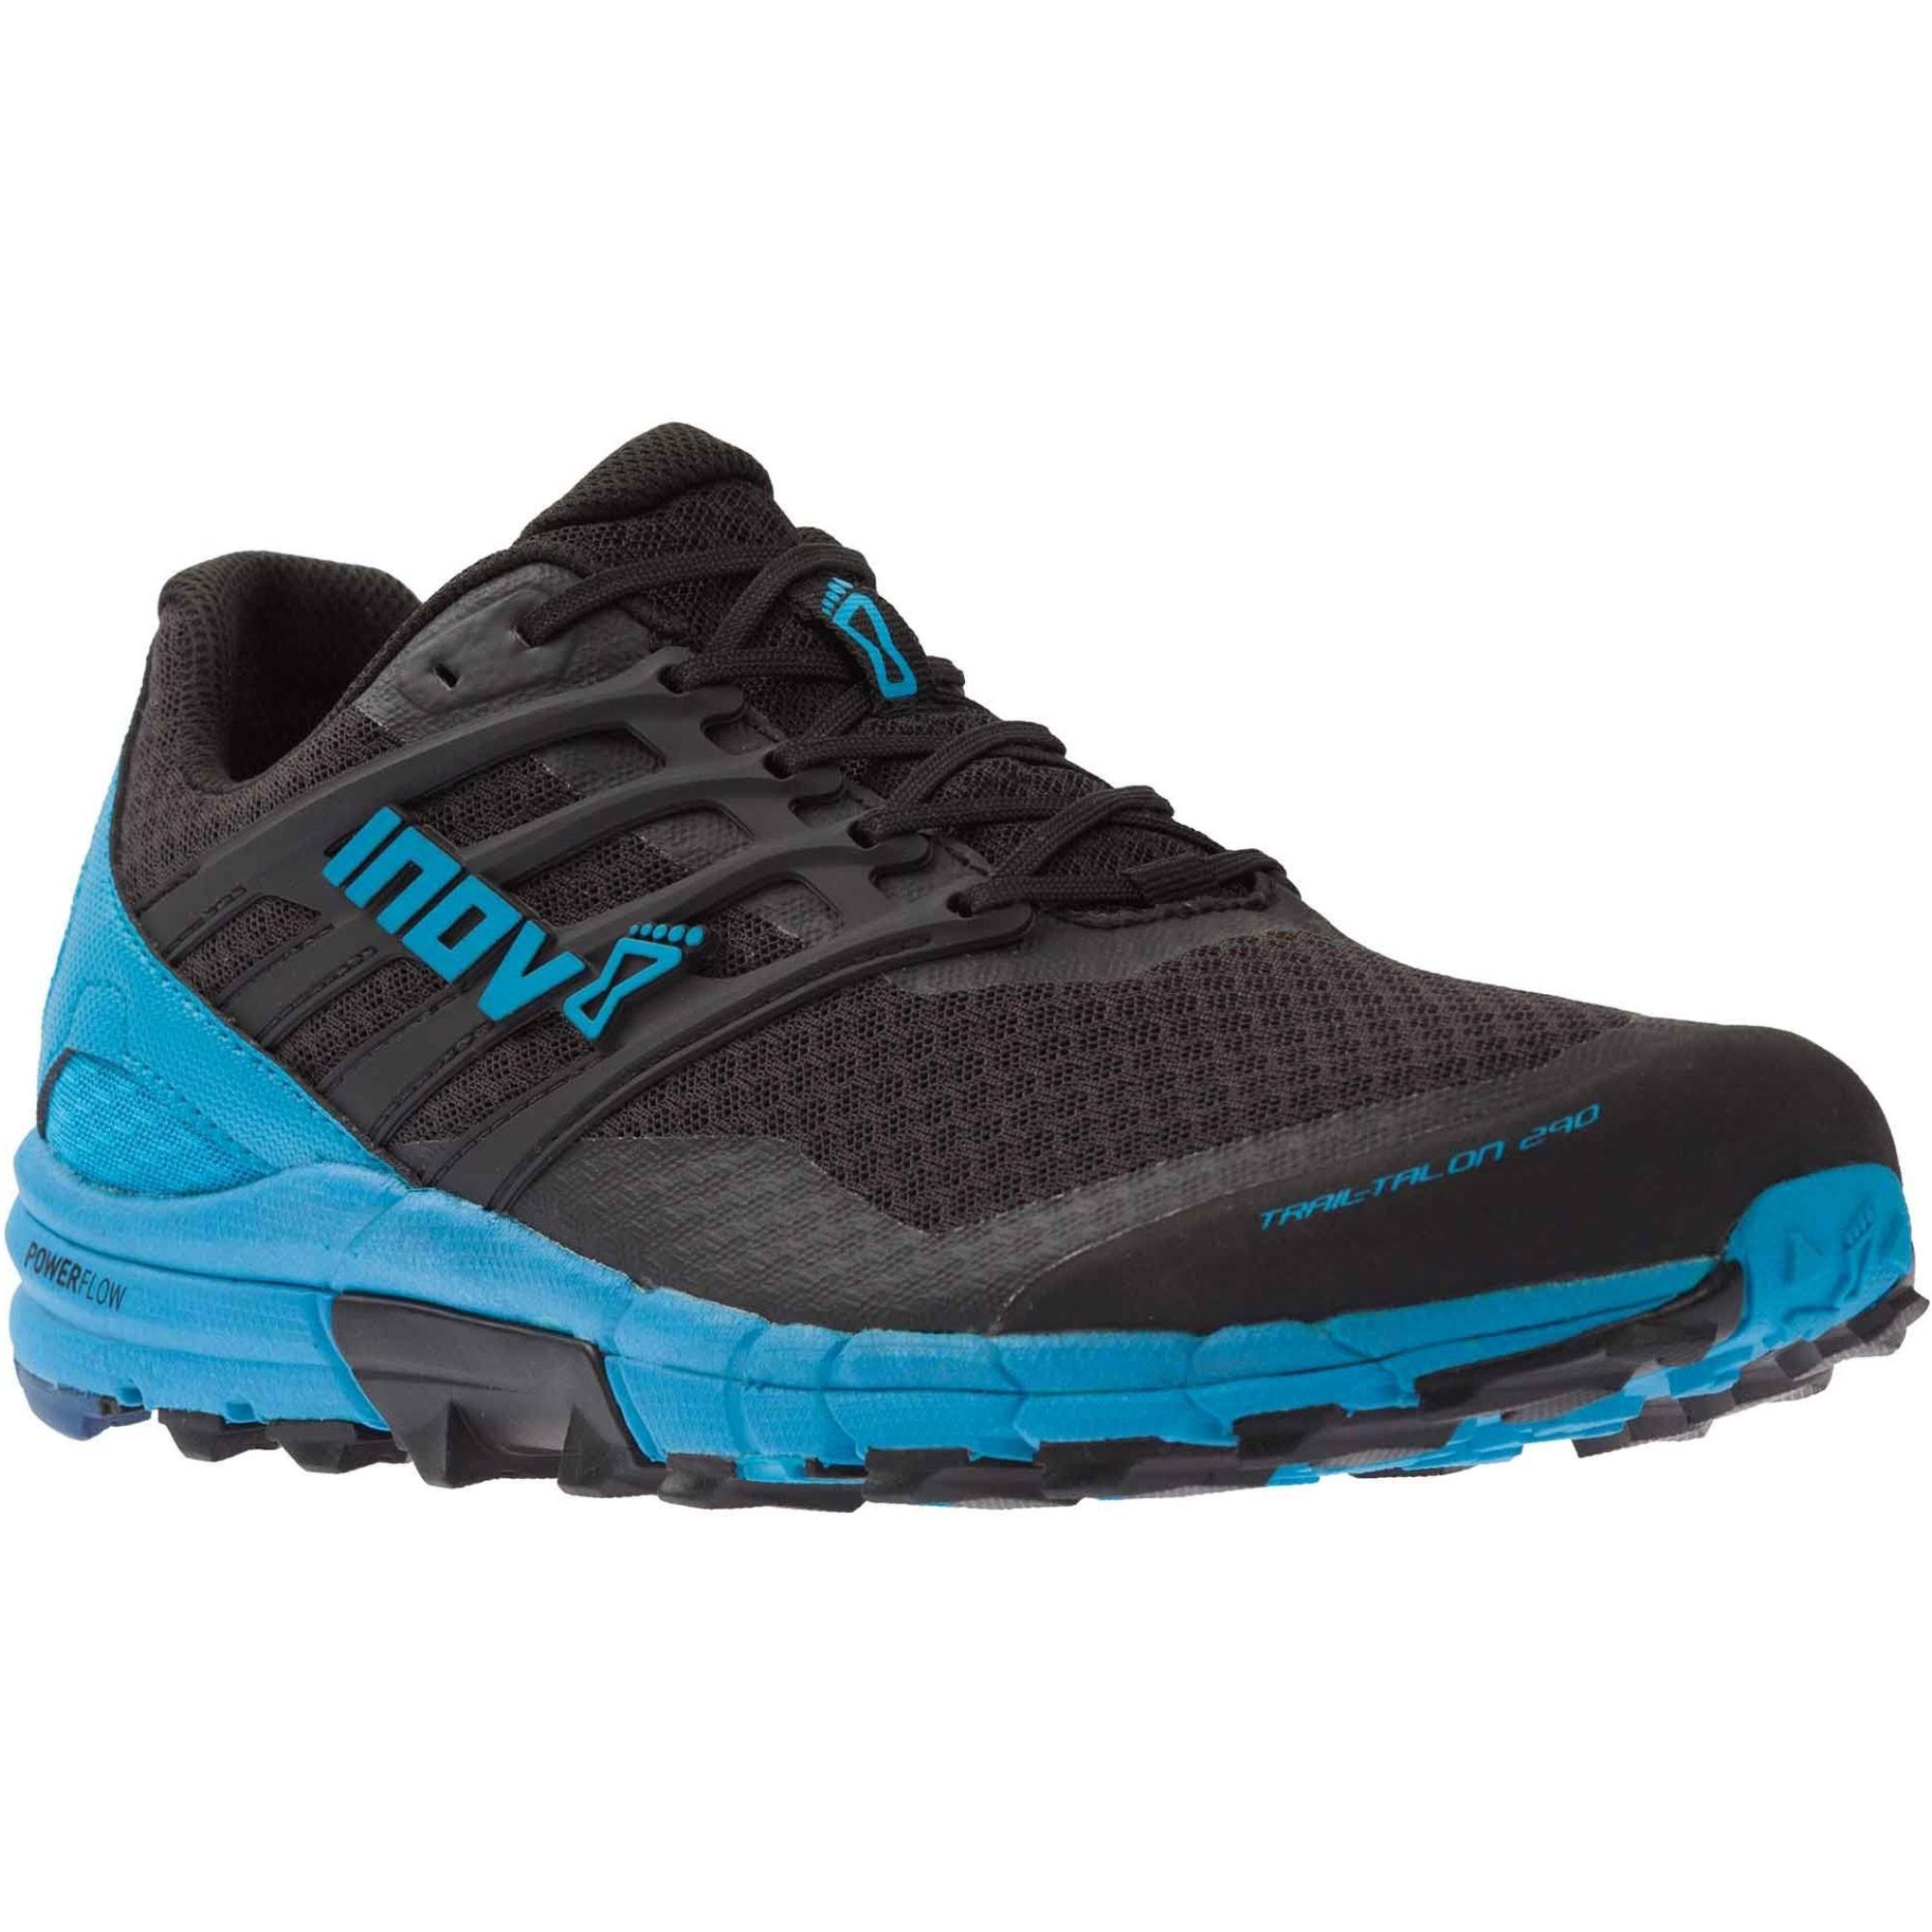 Inov8 Trail Talon 290 Trail Running Shoes - Black/Blue - Angle